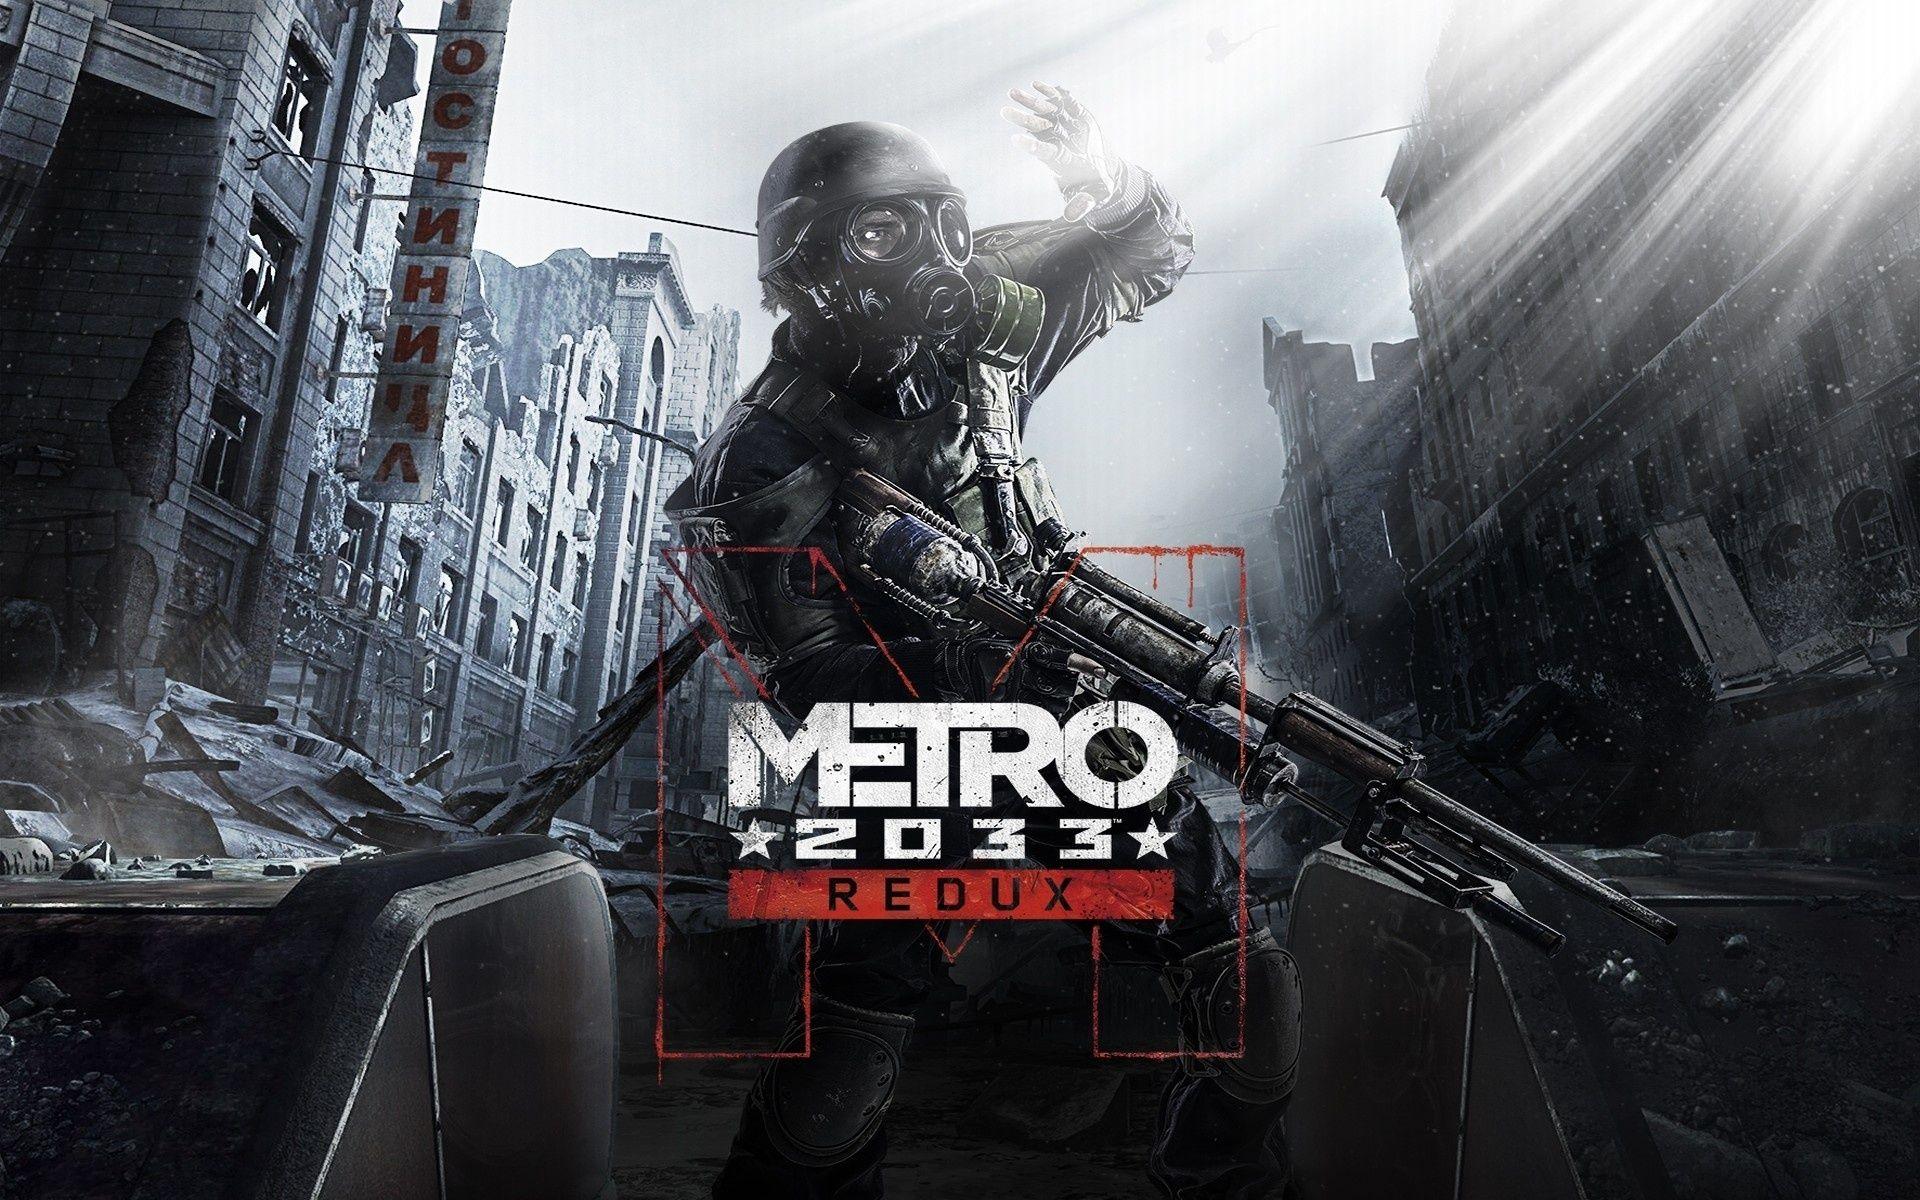 Metro 2033 Redux Hd Desktop Wallpaper Wallpapersme Metro 2033 Metro Last Light Saints Row Iv